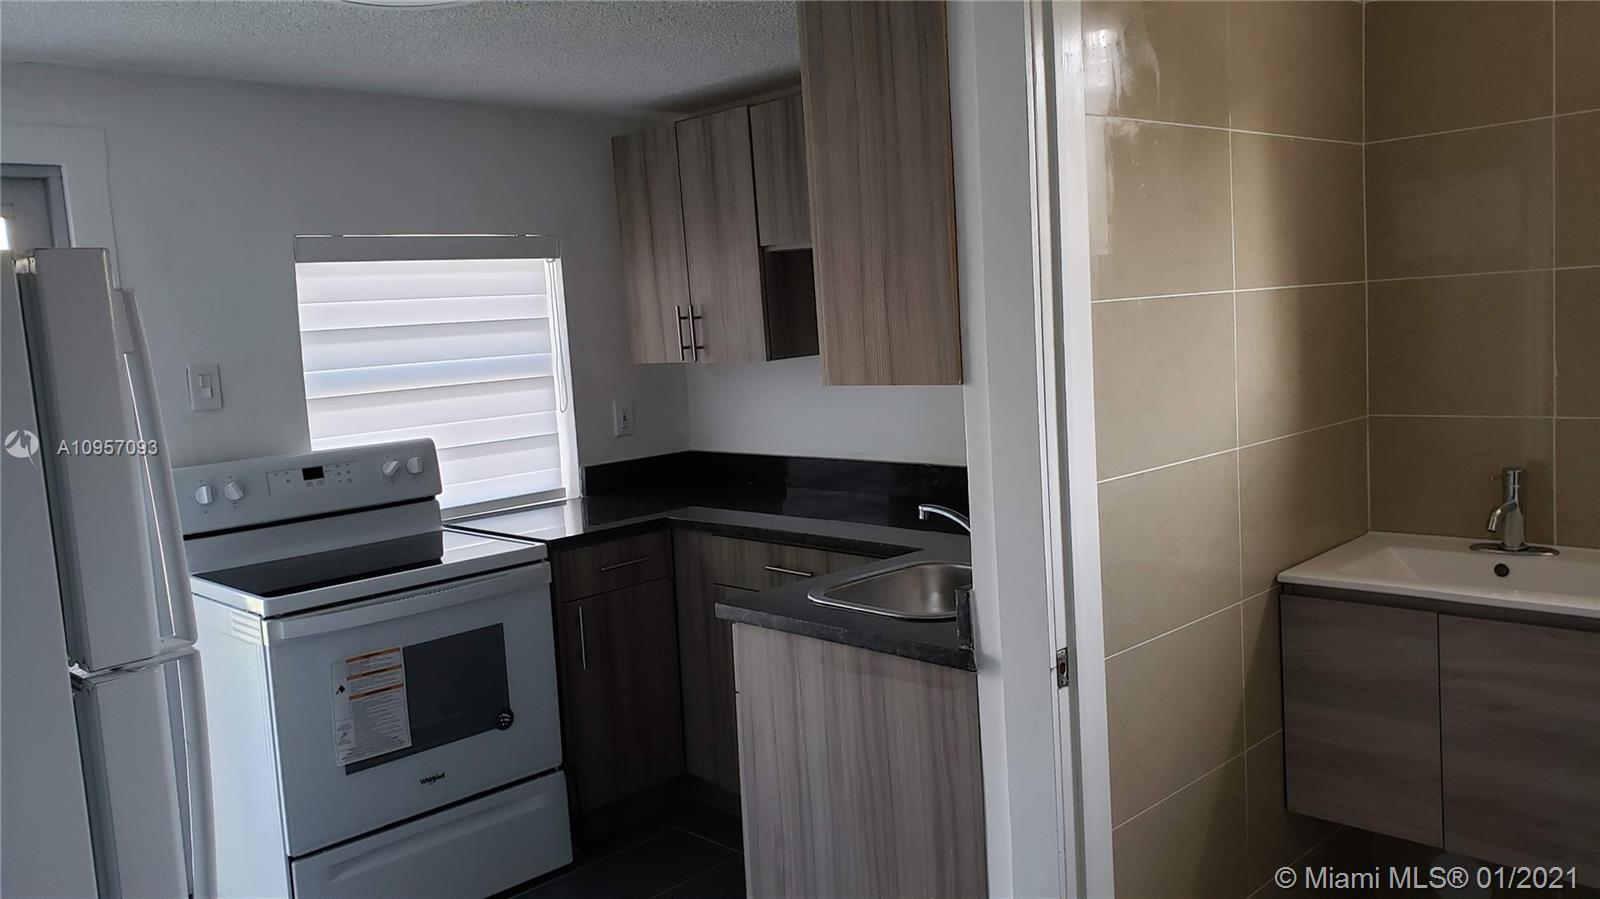 Kitchen - Efficiency/in-law quarters